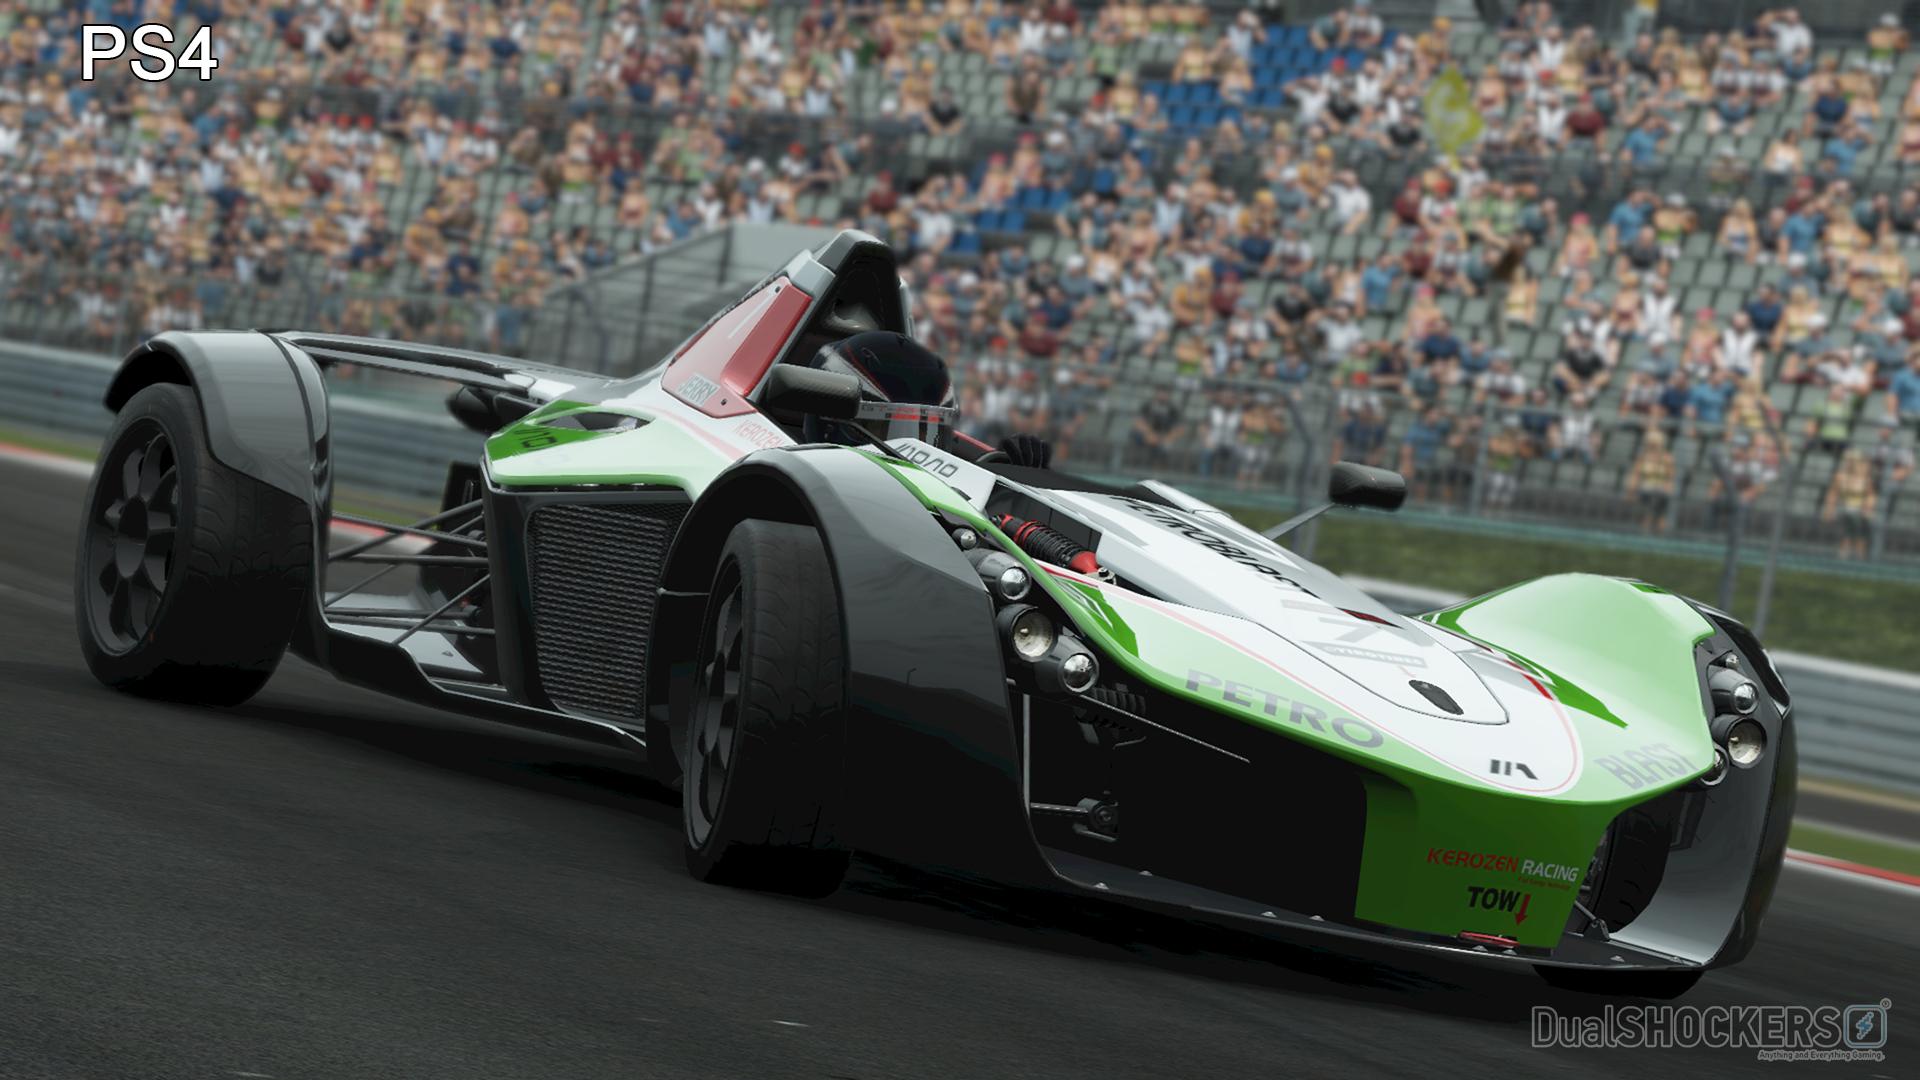 Project CARS Screenshot Comparison: PS4 Vs PC Version On